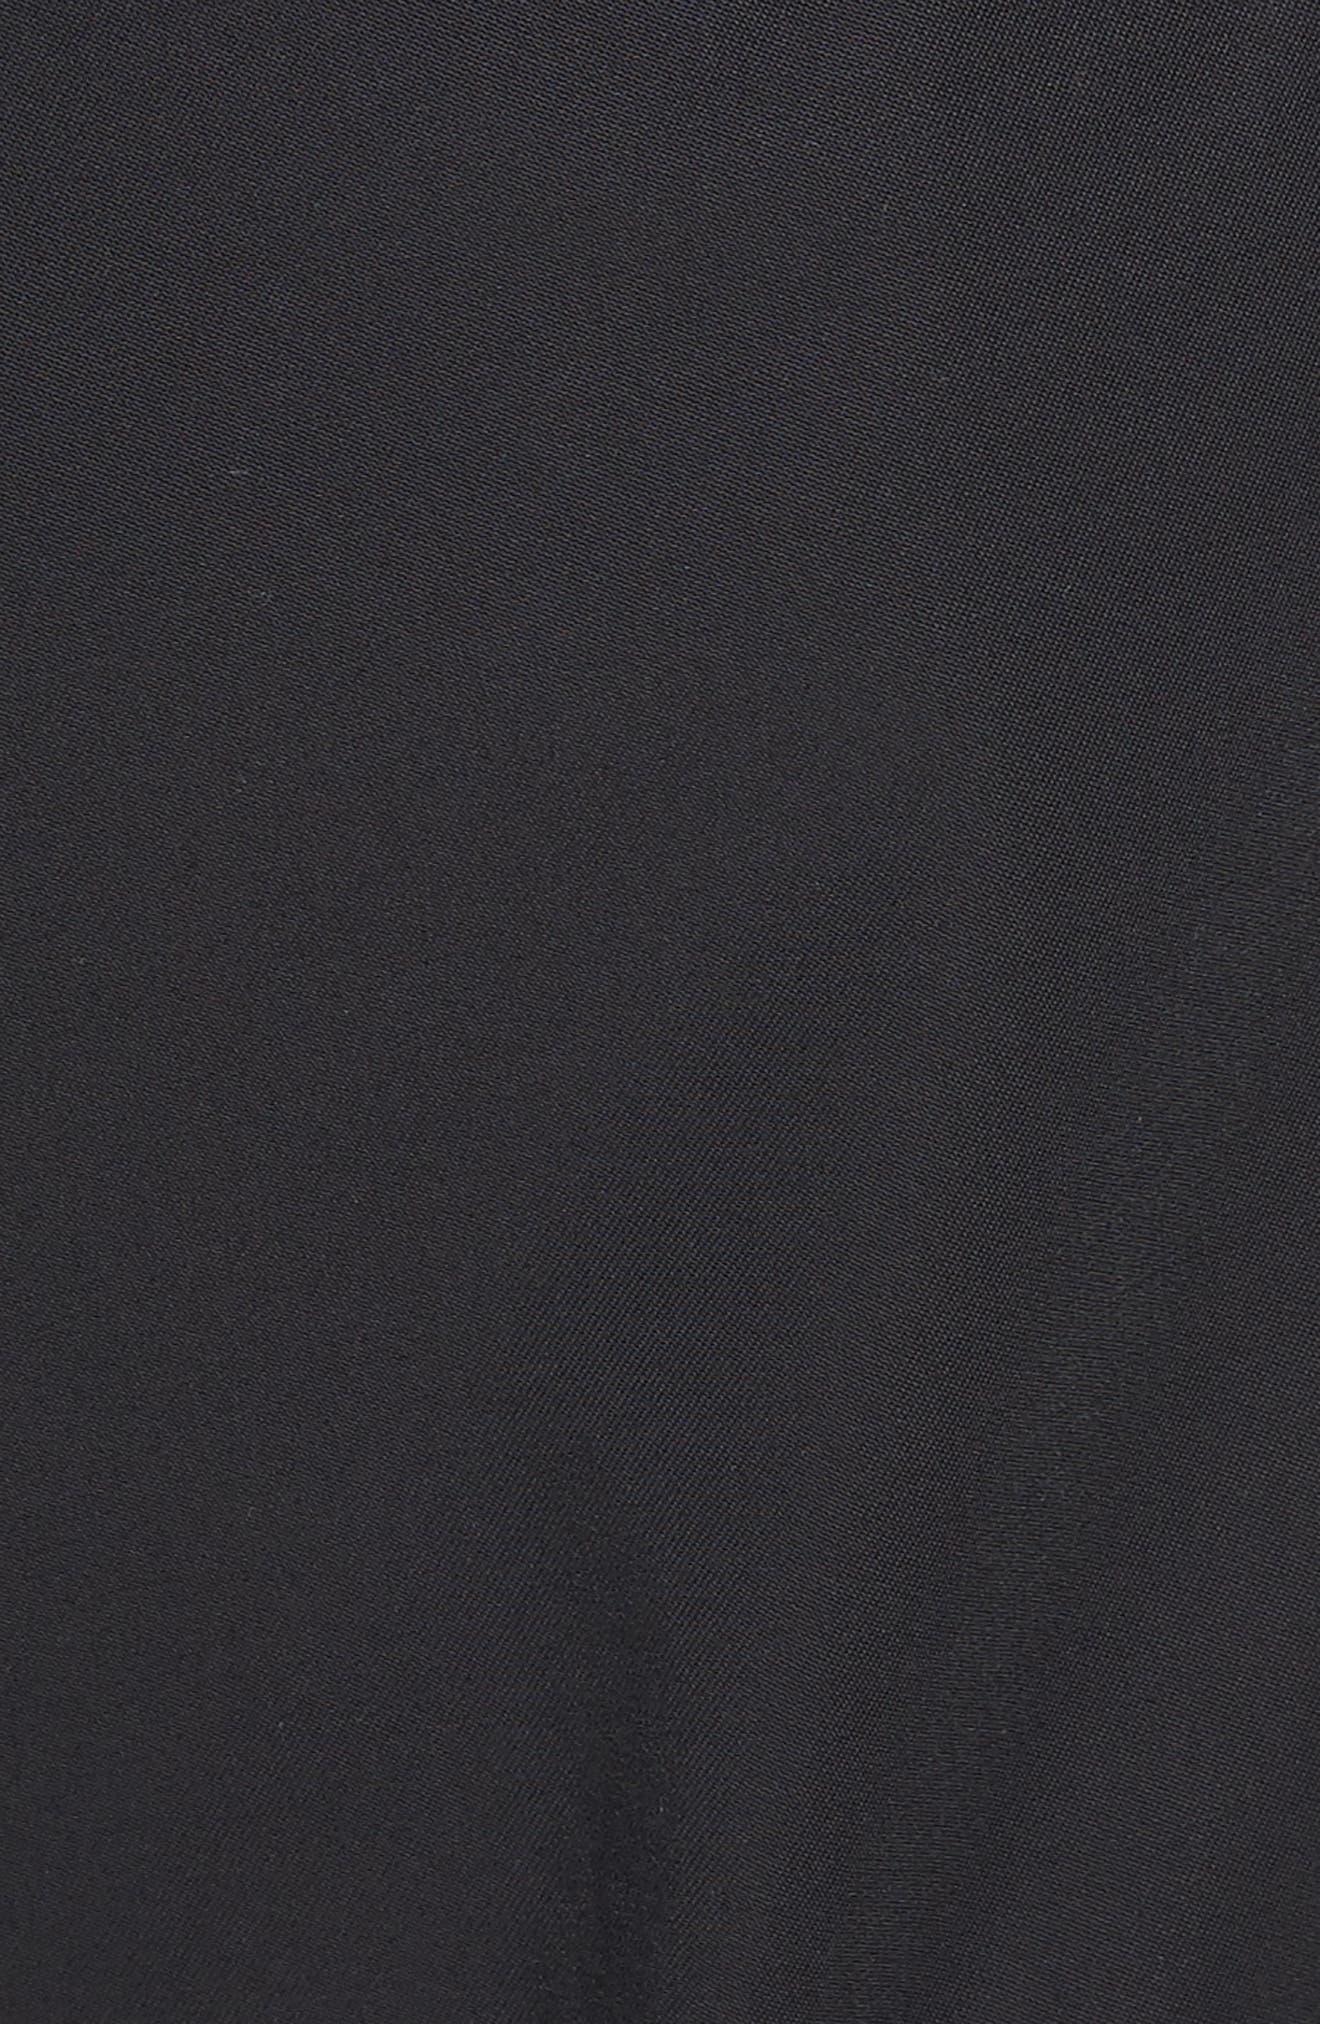 Cargo Jogger Pants,                             Alternate thumbnail 6, color,                             Black